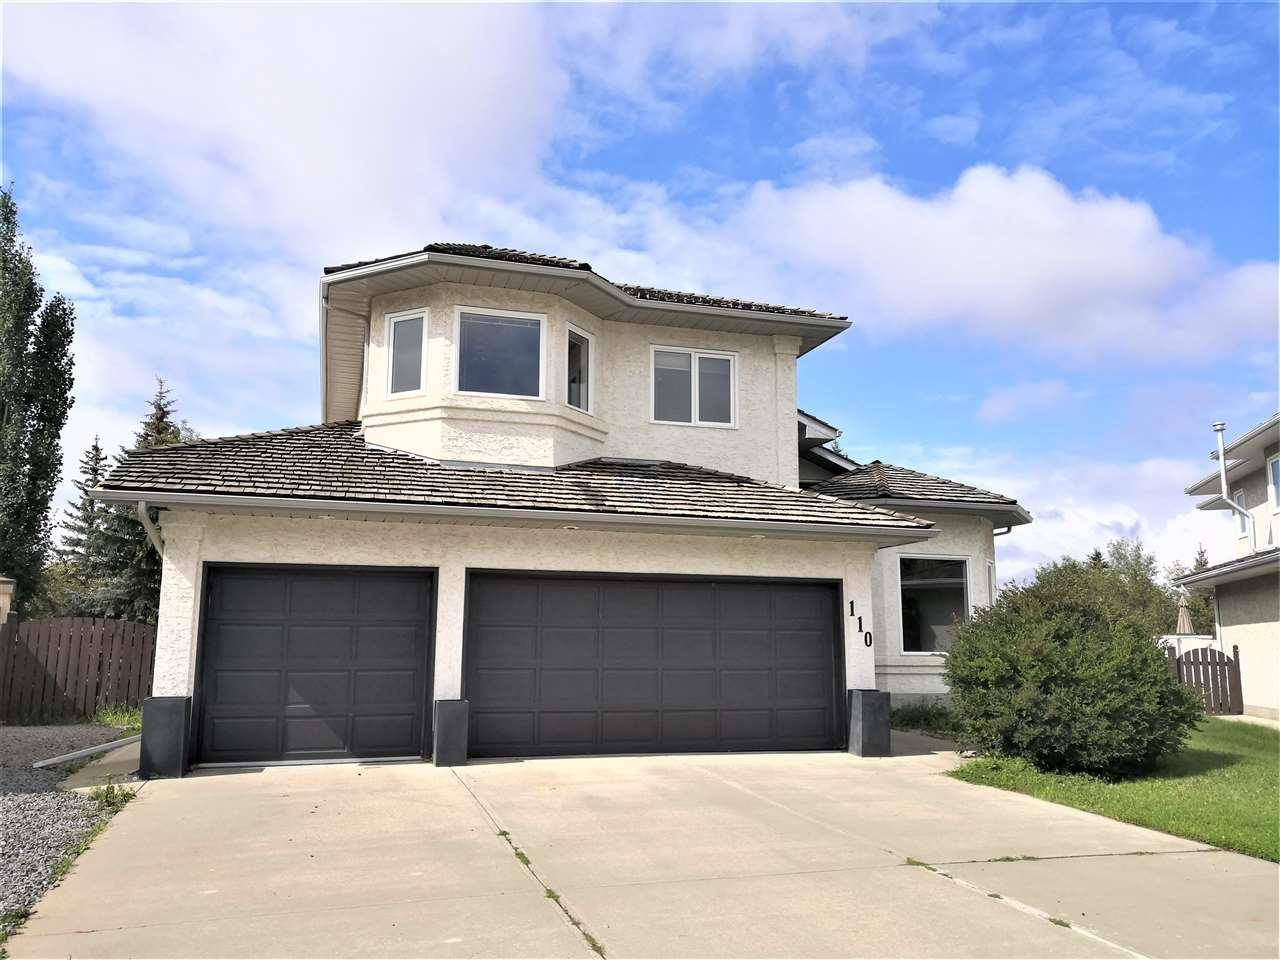 House for sale at 110 Roche Cres Nw Edmonton Alberta - MLS: E4171736